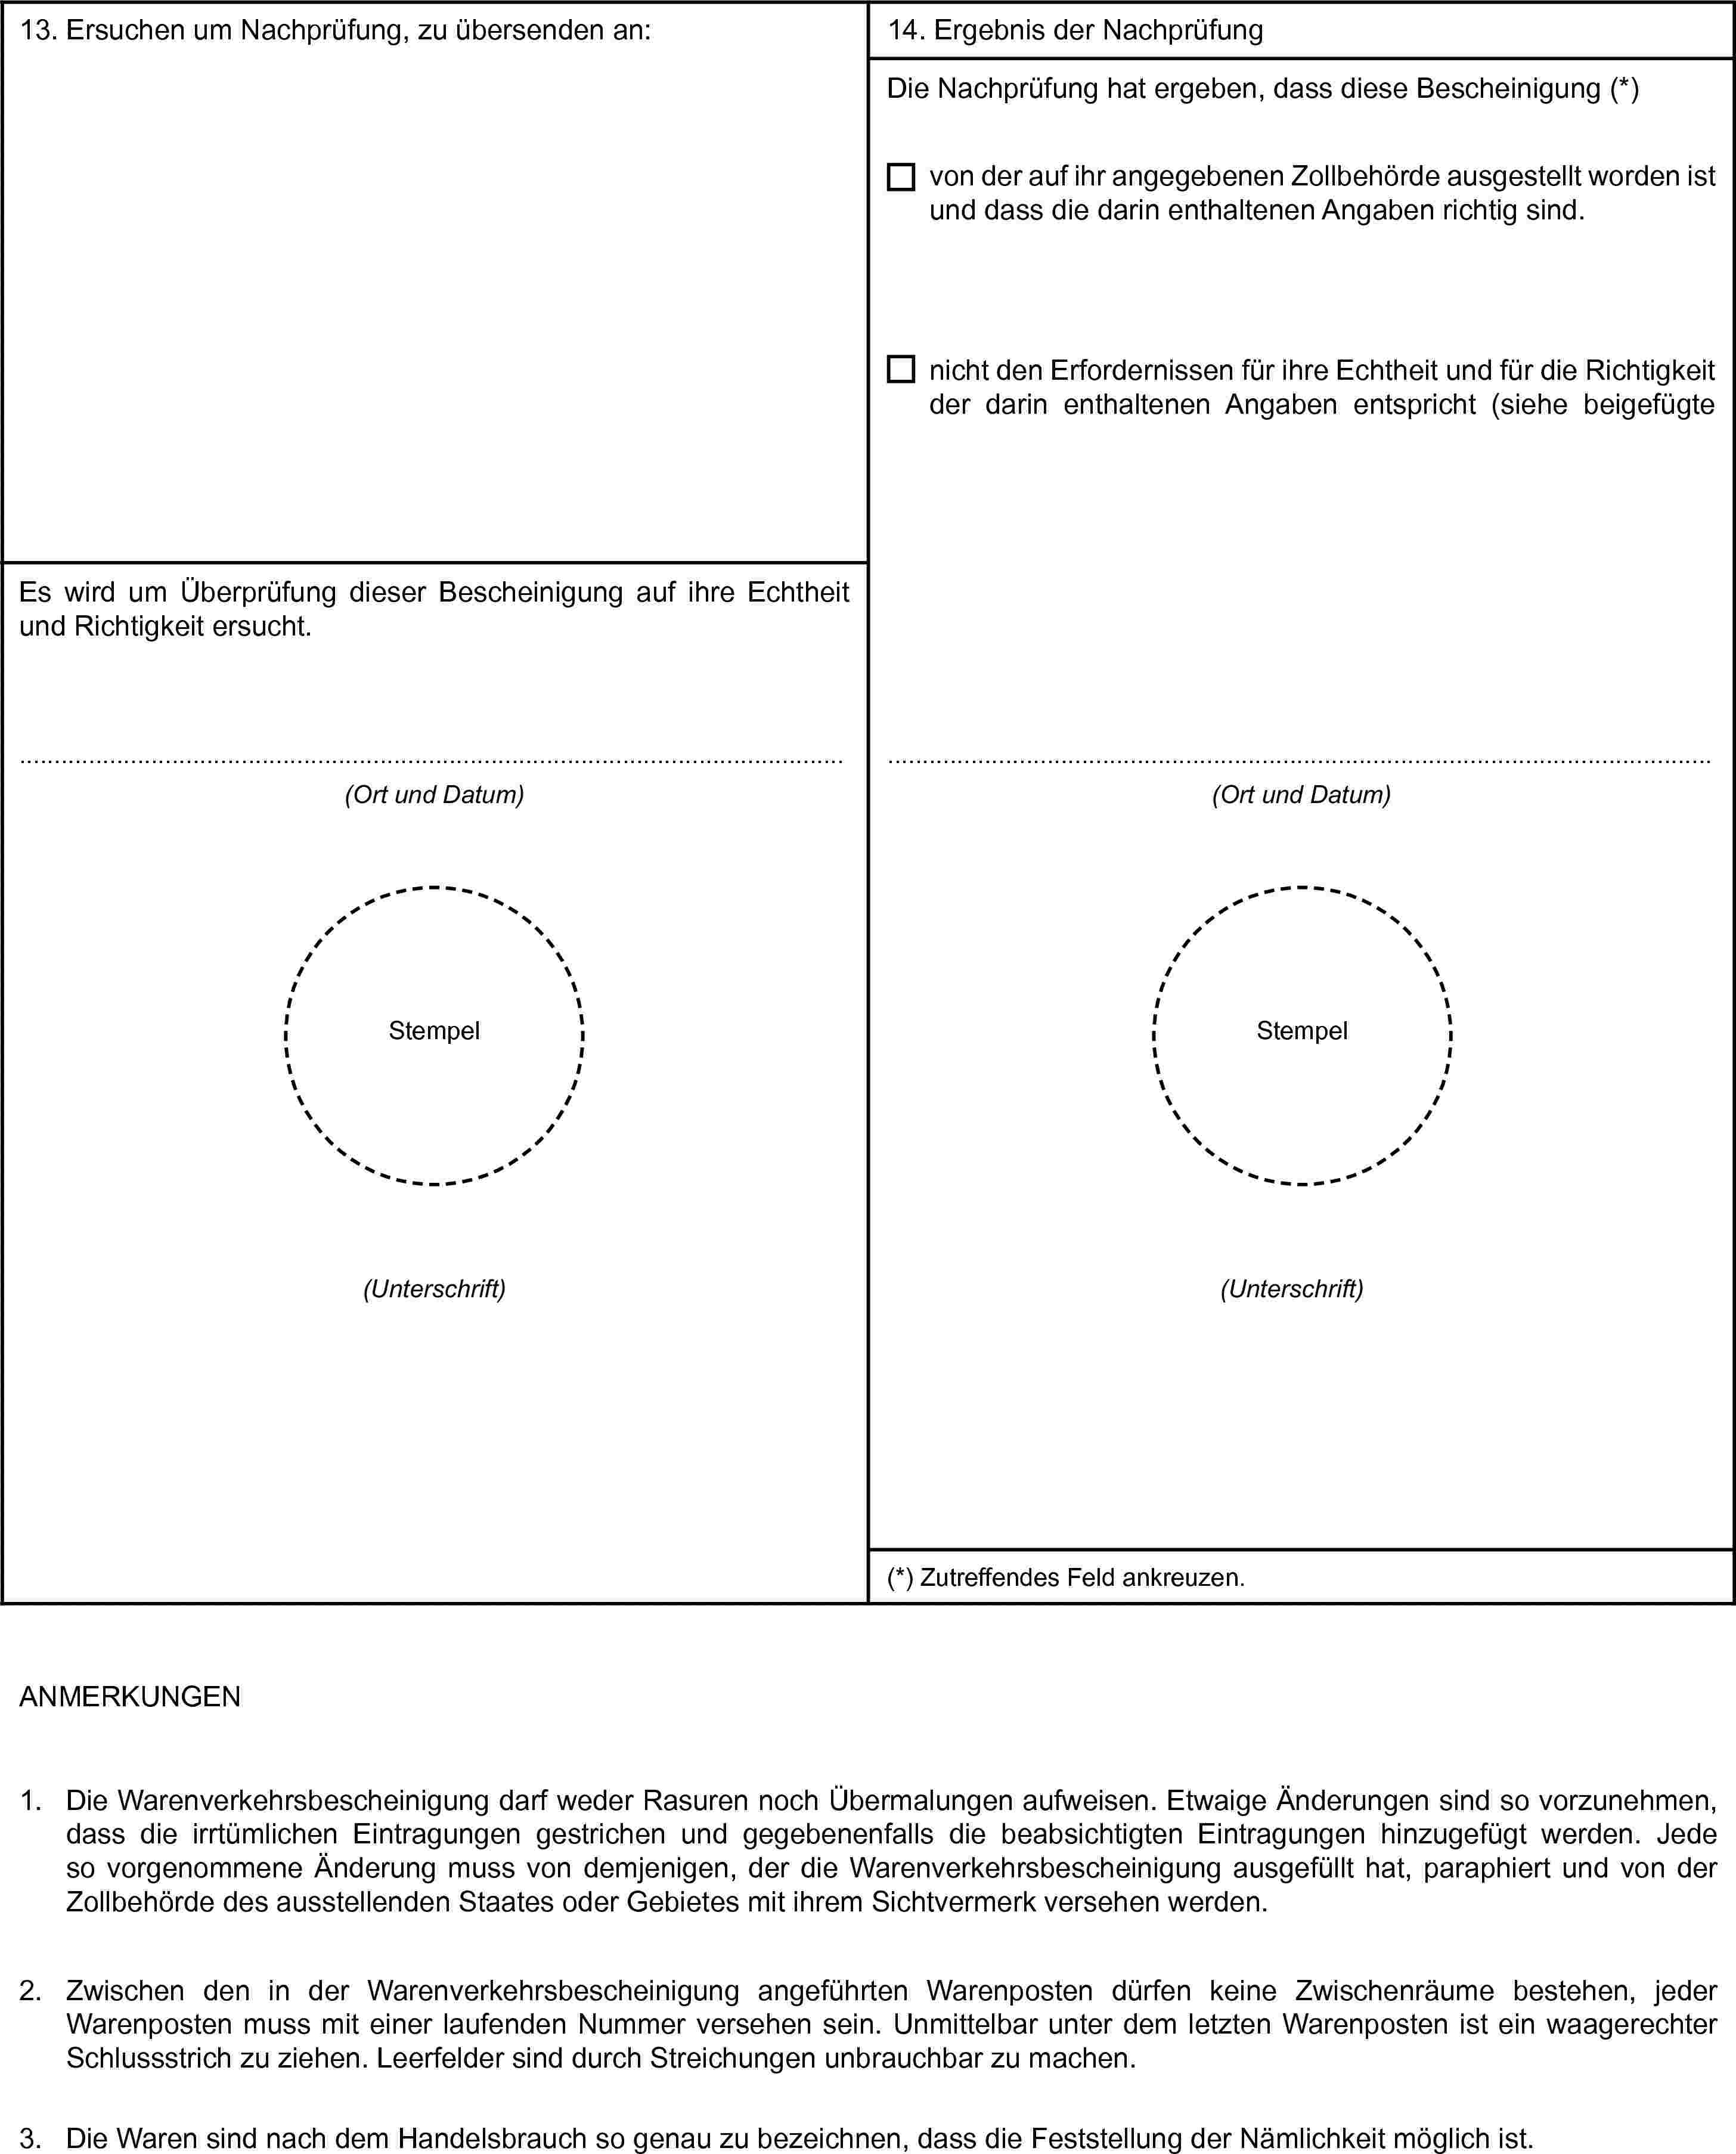 EUR-Lex - 02007R1528-20130701 - EN - EUR-Lex